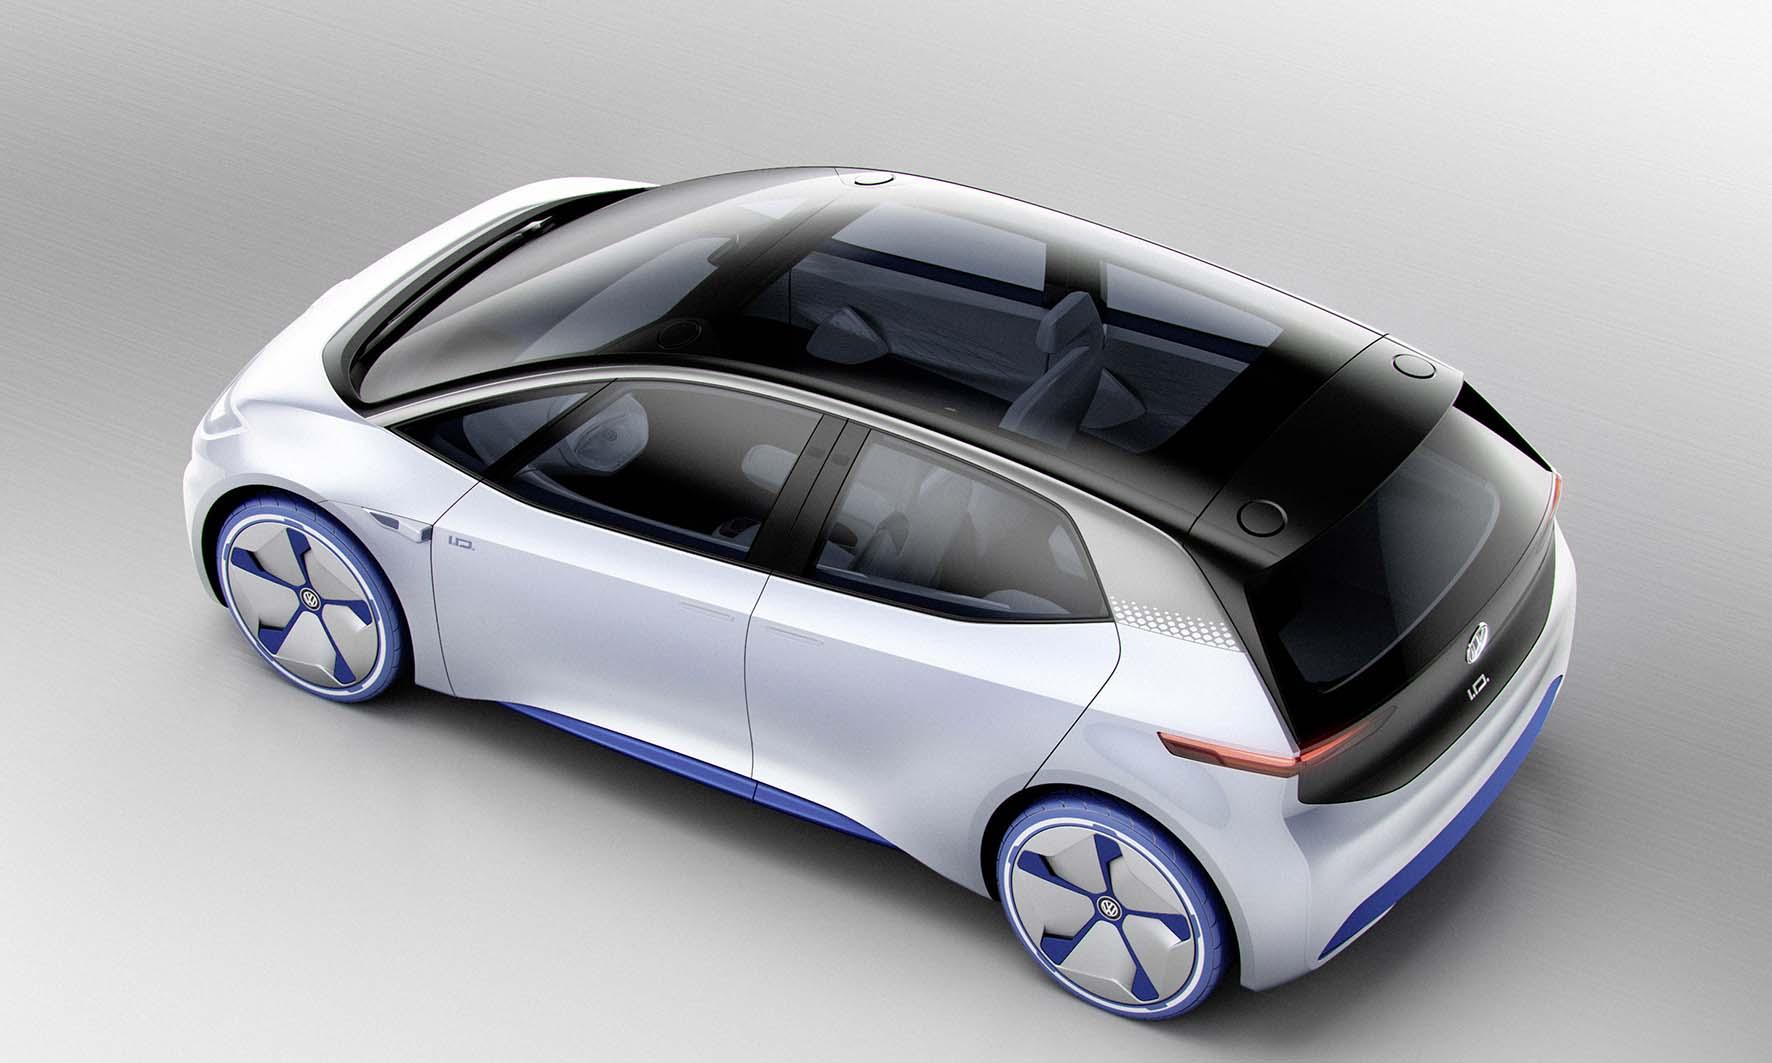 Volkswagen prototipo elettrico ID postlat alto